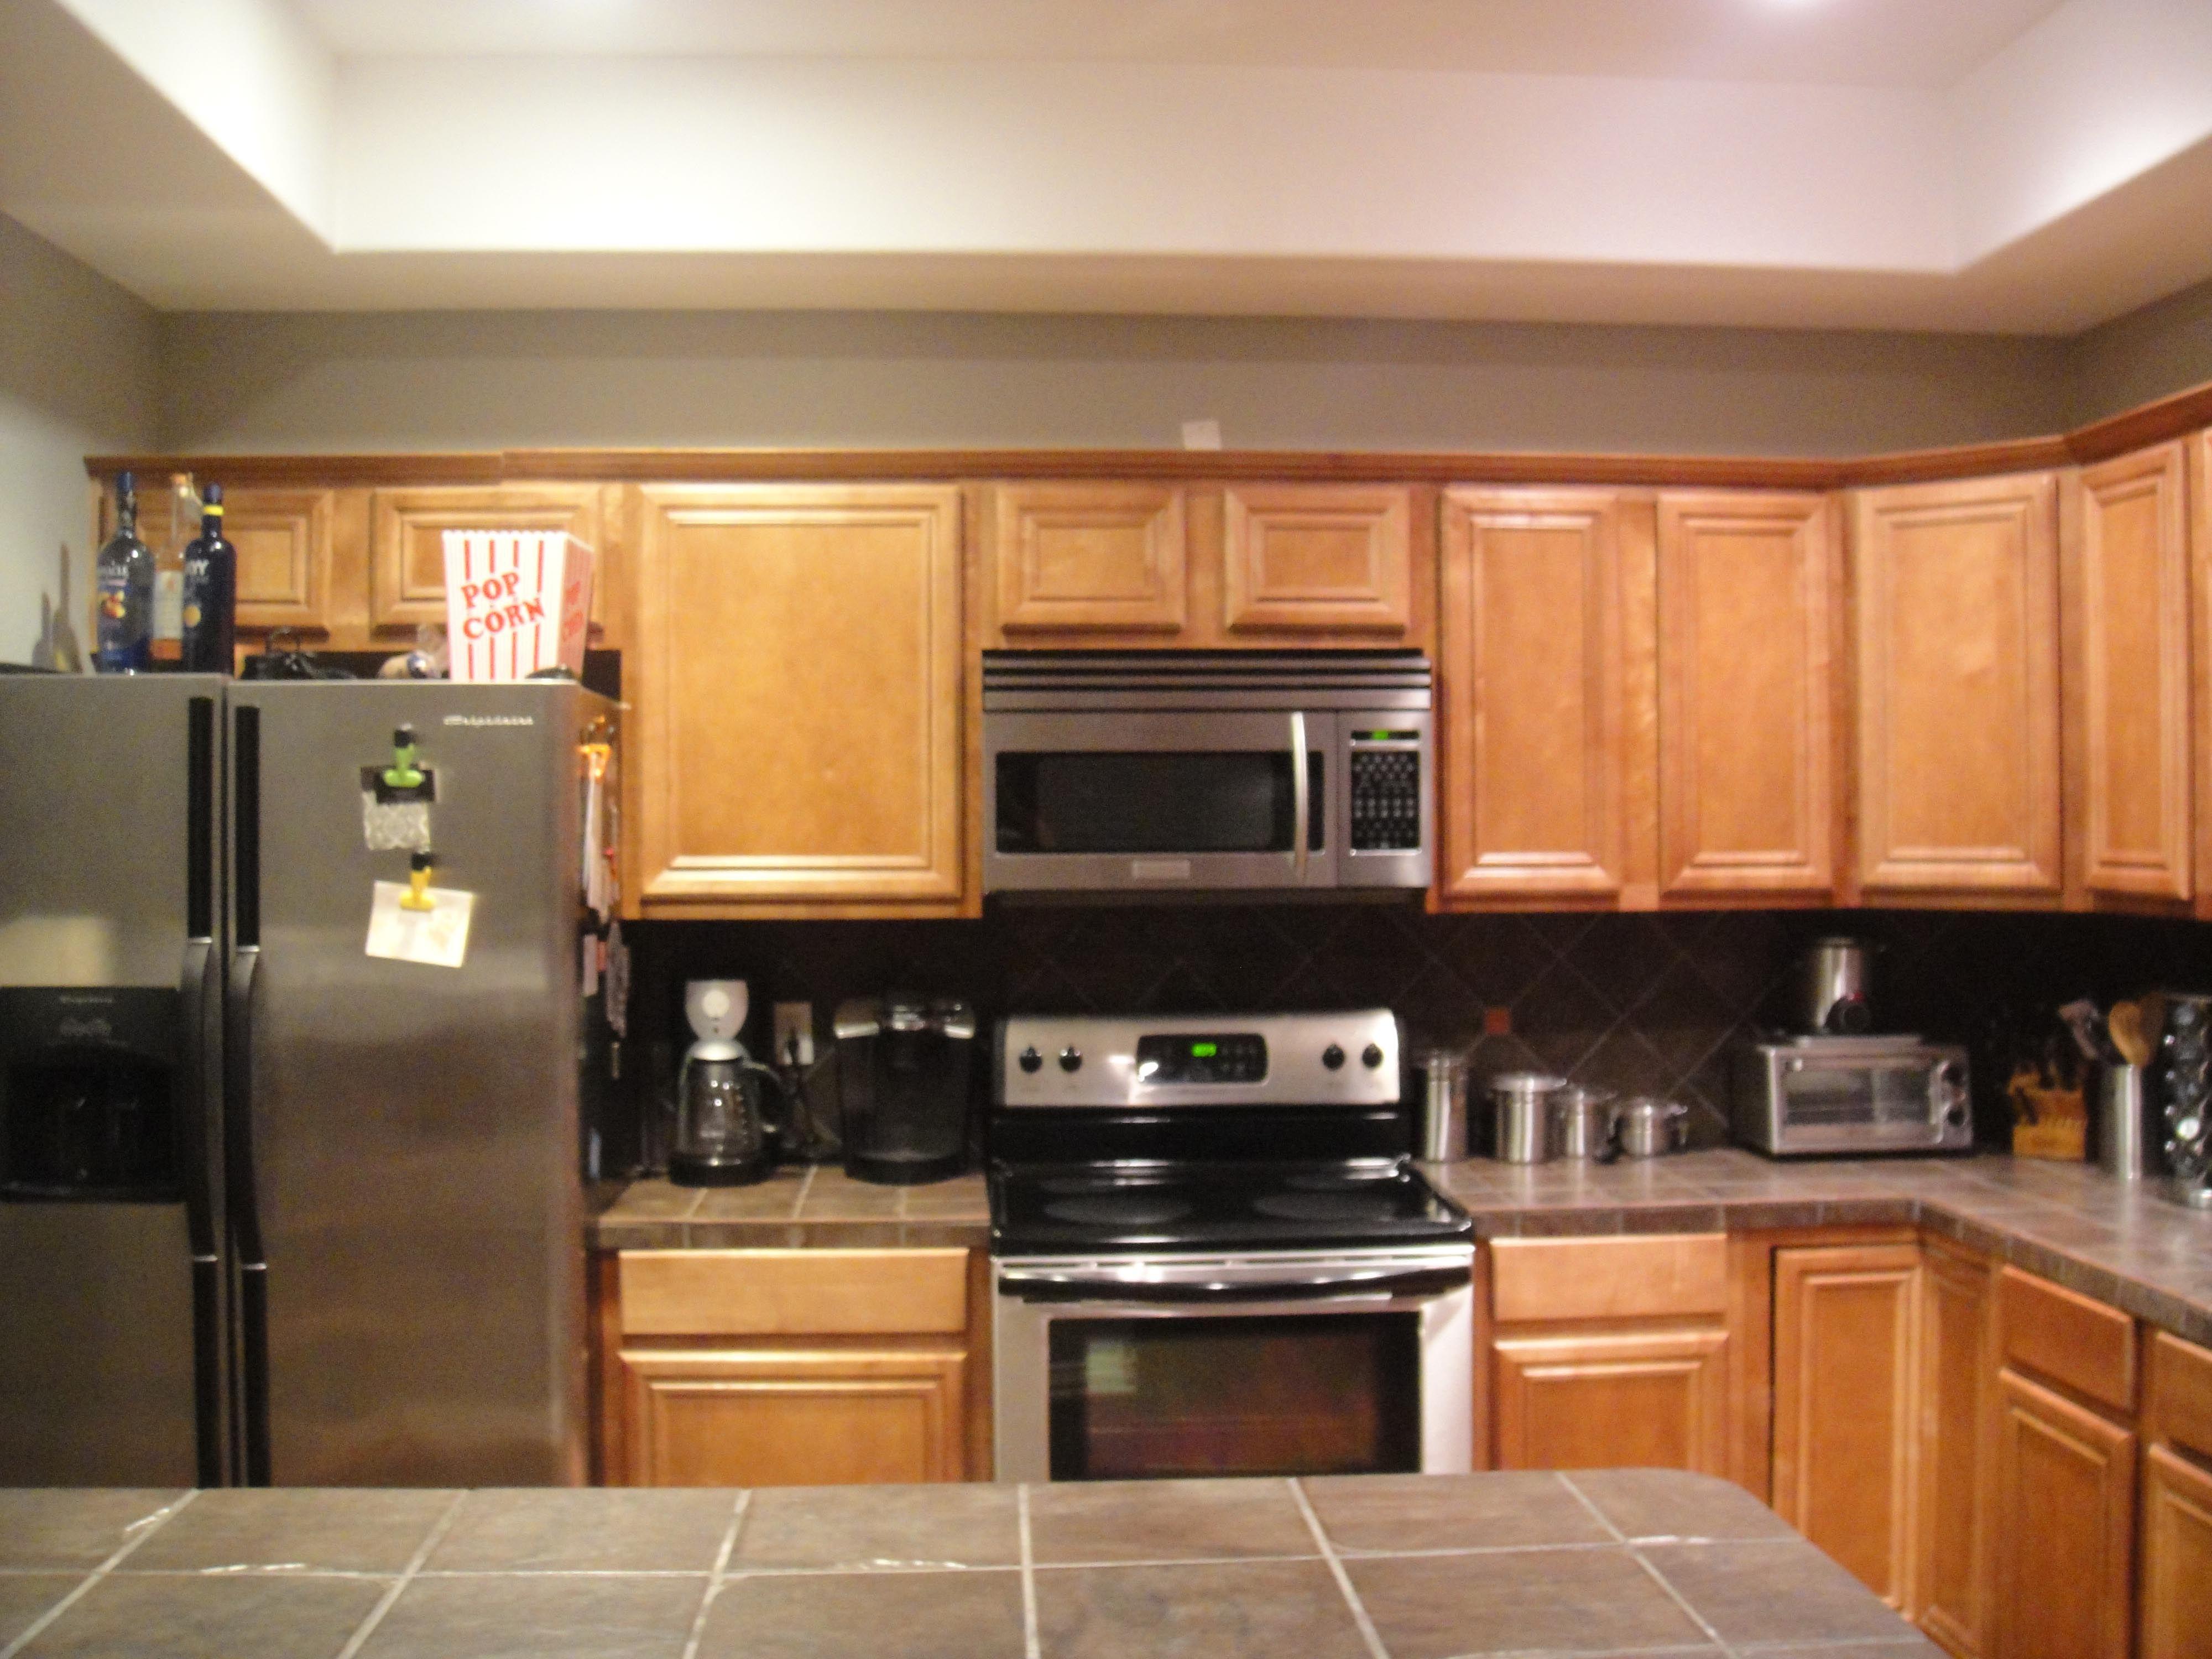 master bedroom kitchen colors with dark oak cabinets cabinet organization muffin cupcake pans drinkware stock soup multi pots dishwashers blenders - Multi Kitchen Ideas